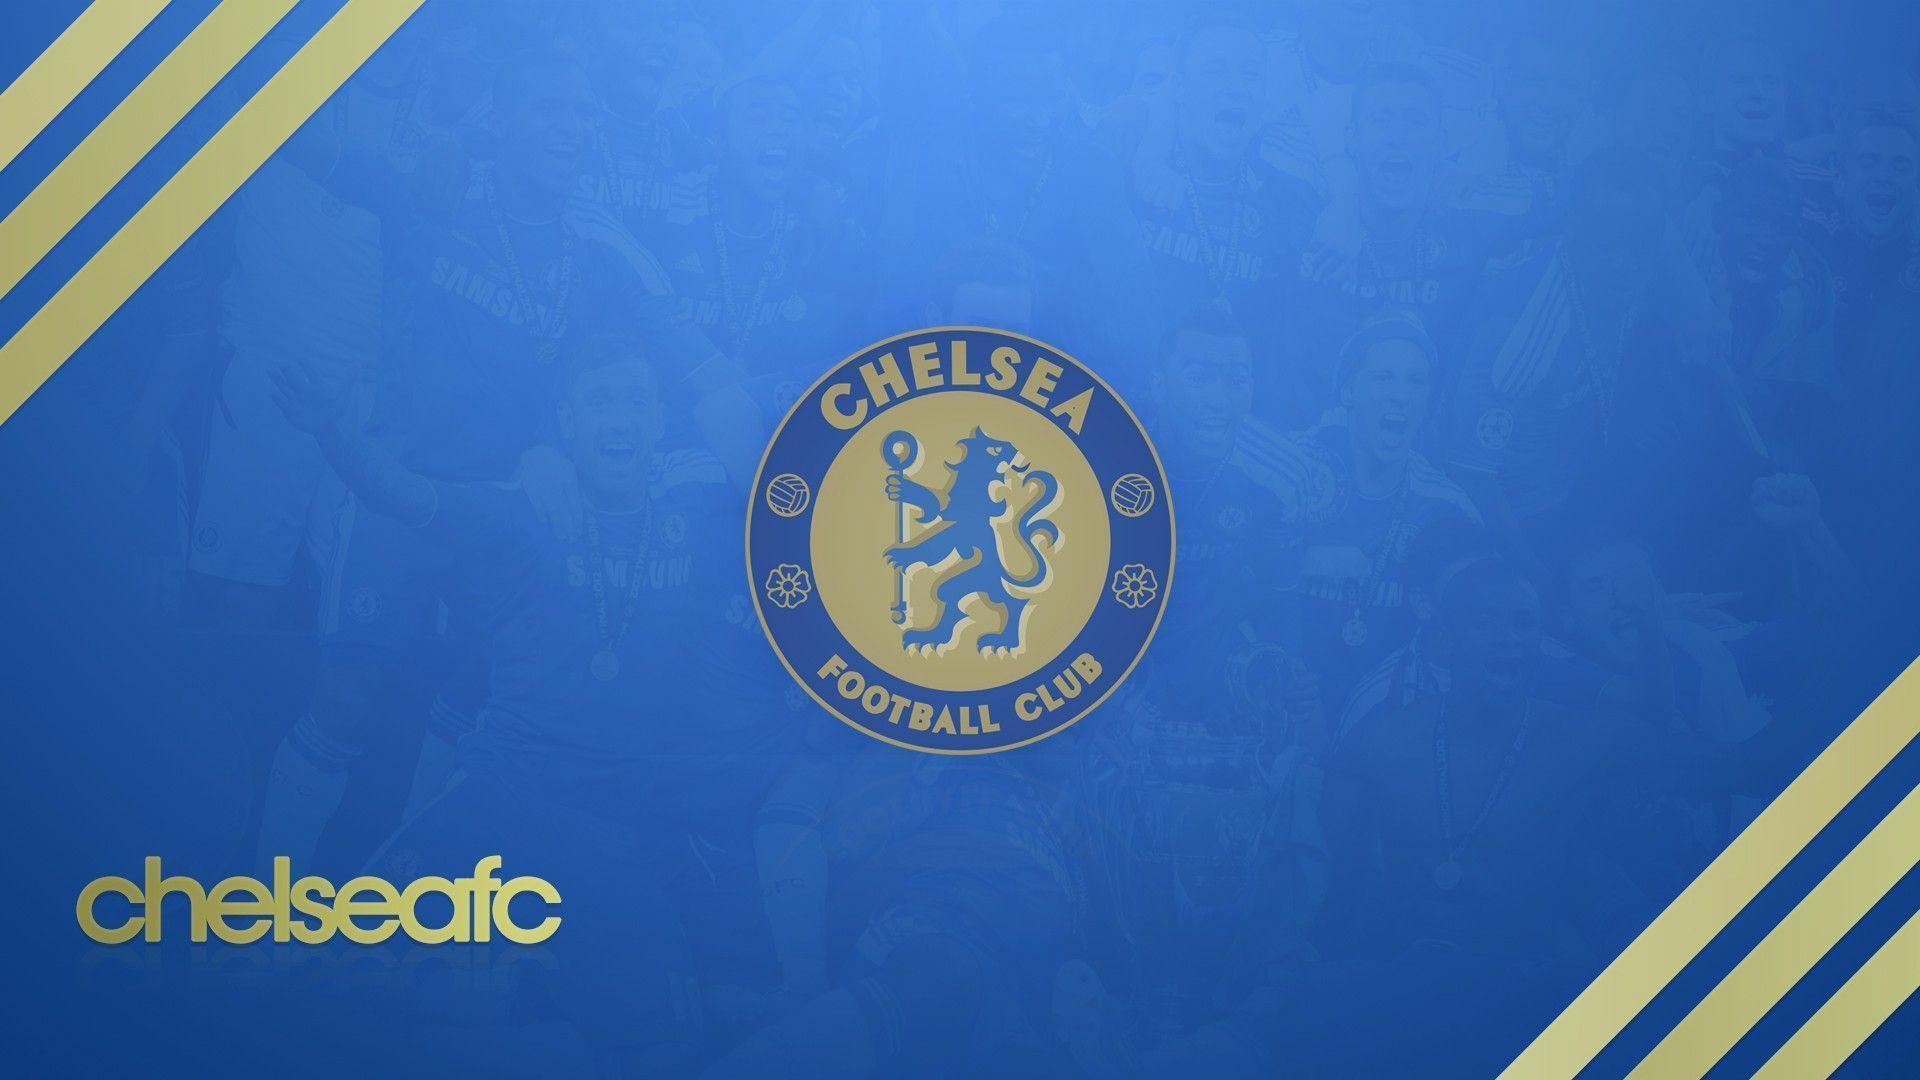 Chelsea F.C. Background 10